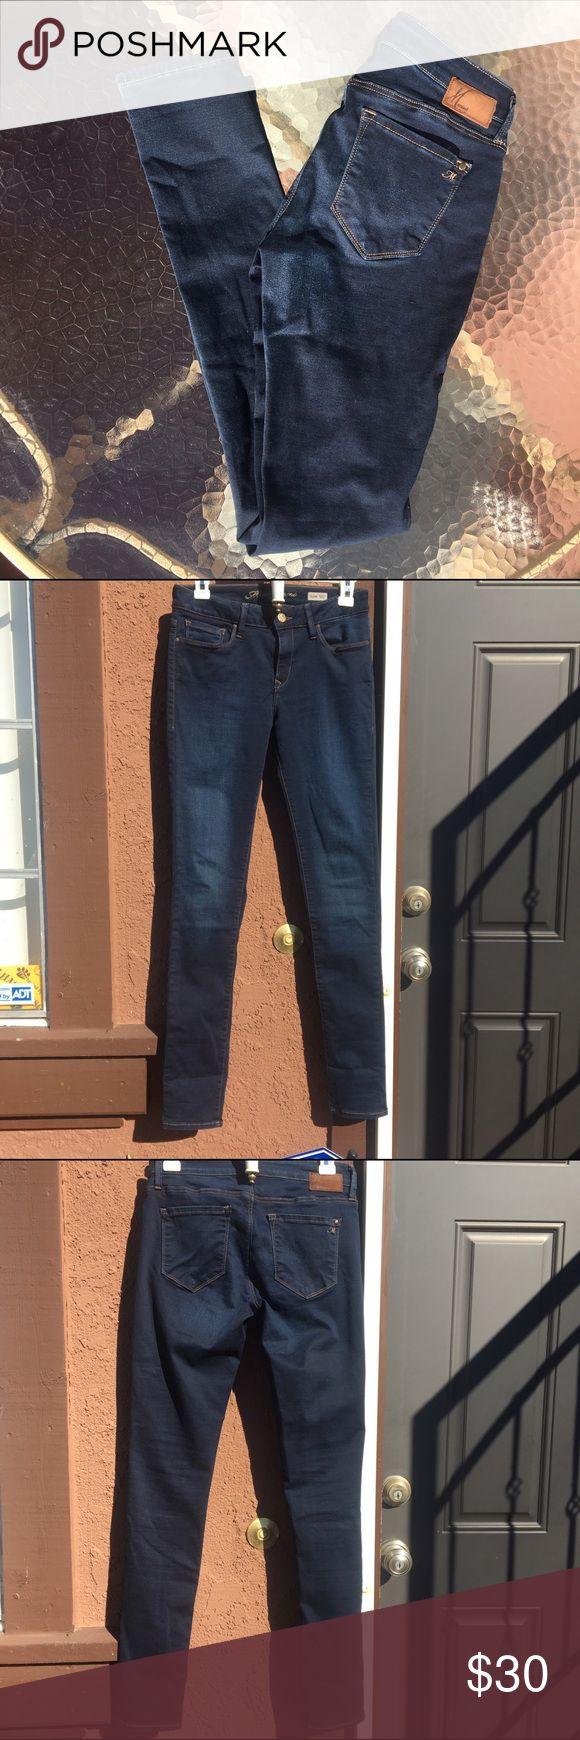 "Mavi Alexa Mid Rise Skinny Jeans, Dark Blue Mavi Alexa Mid Rise Skinny Jeans. 8"" rise, 32"" hem. 63% cotton, 33% eme (polyester), and 4% elastase. These are very, very stretchy. Mavi Jeans Skinny"